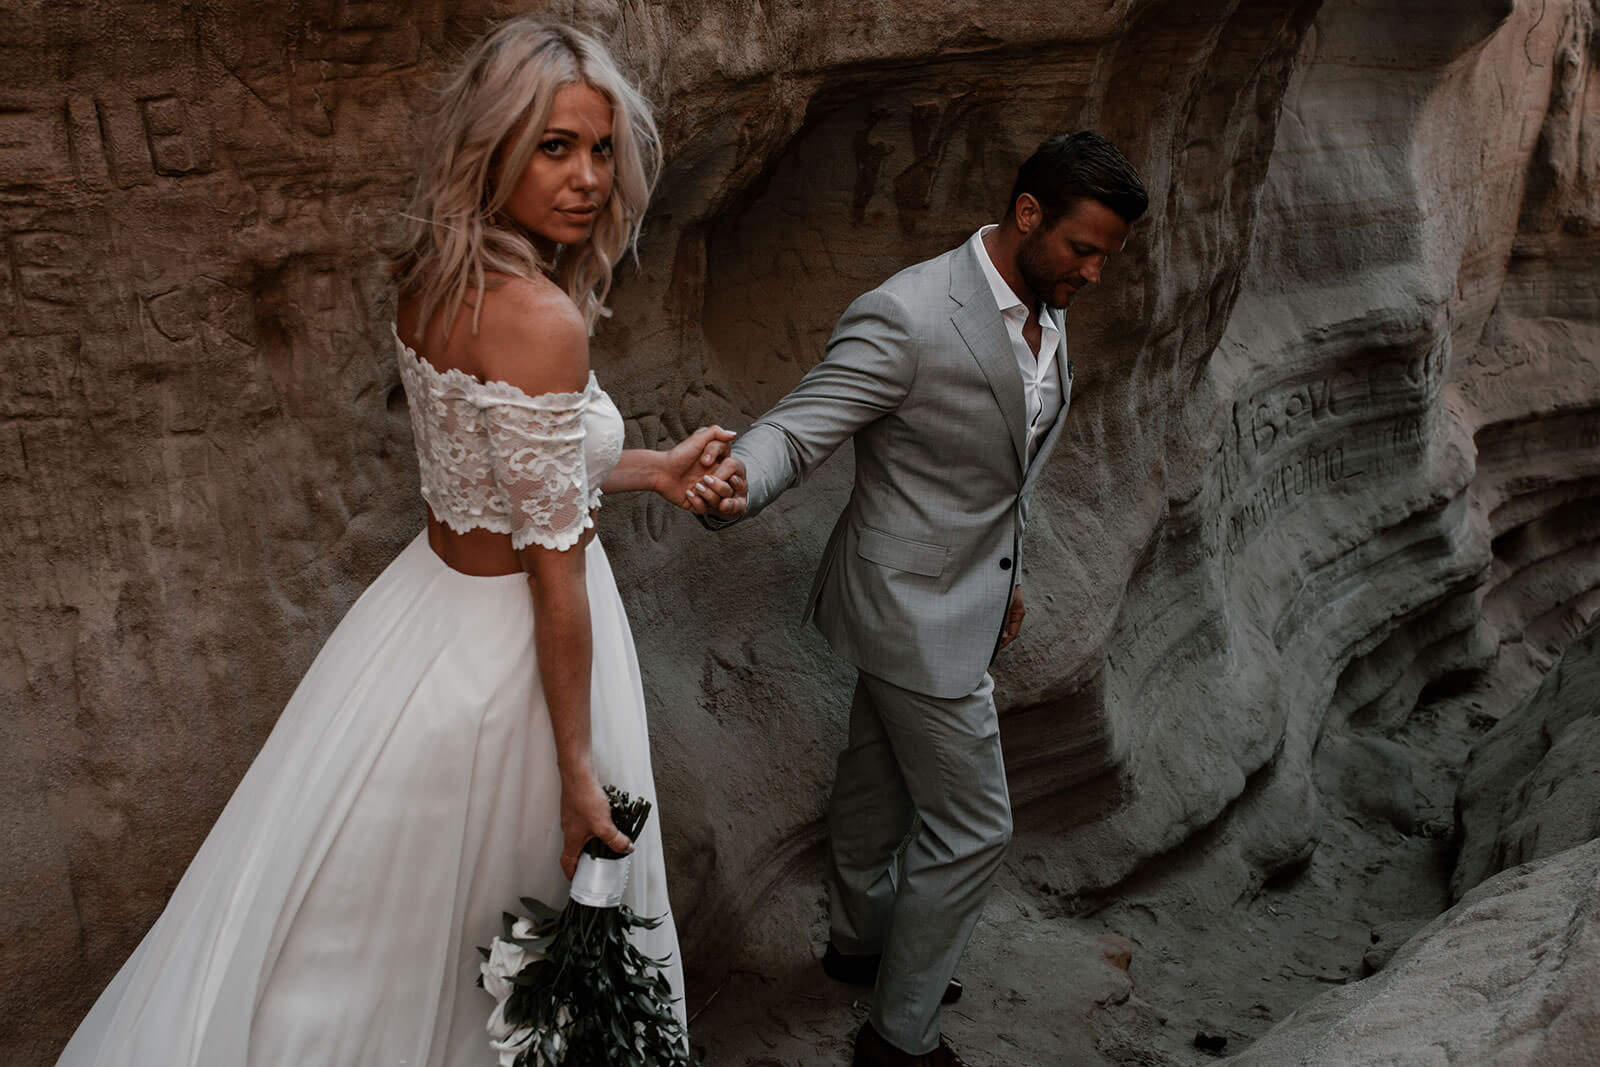 Blonde bride wearing Grace Loves Lace Luna Gown following groom down sandy cavern holding bouquet